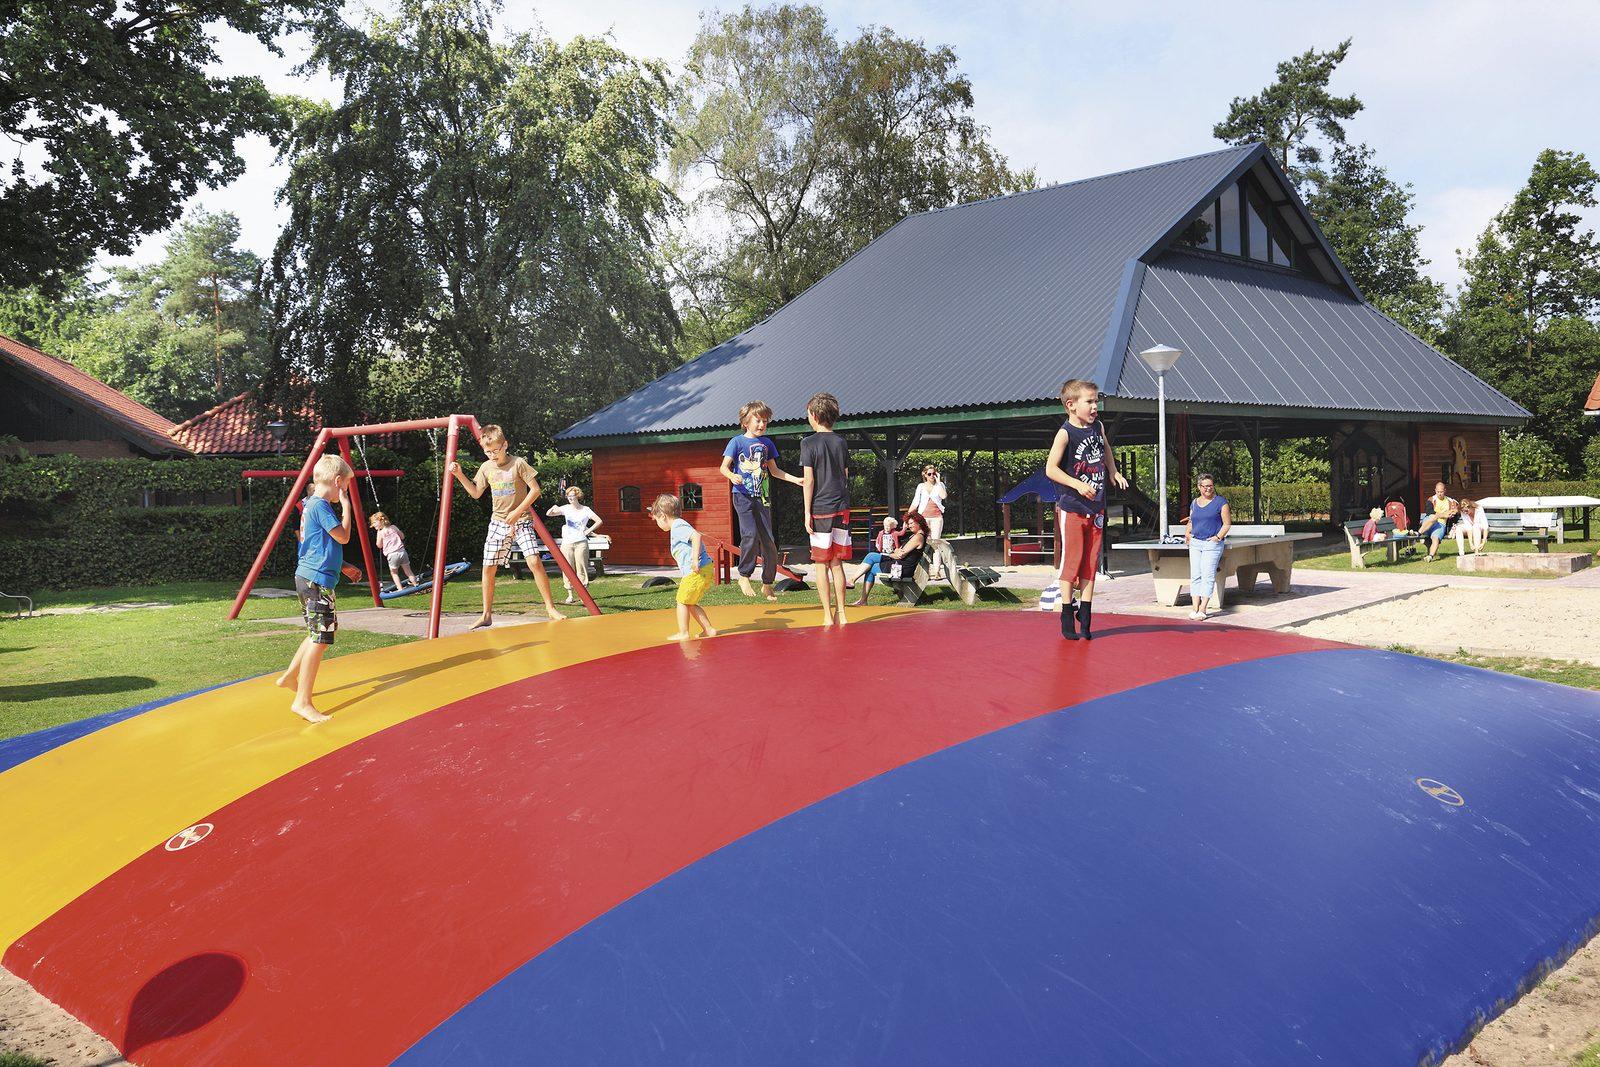 Large playground